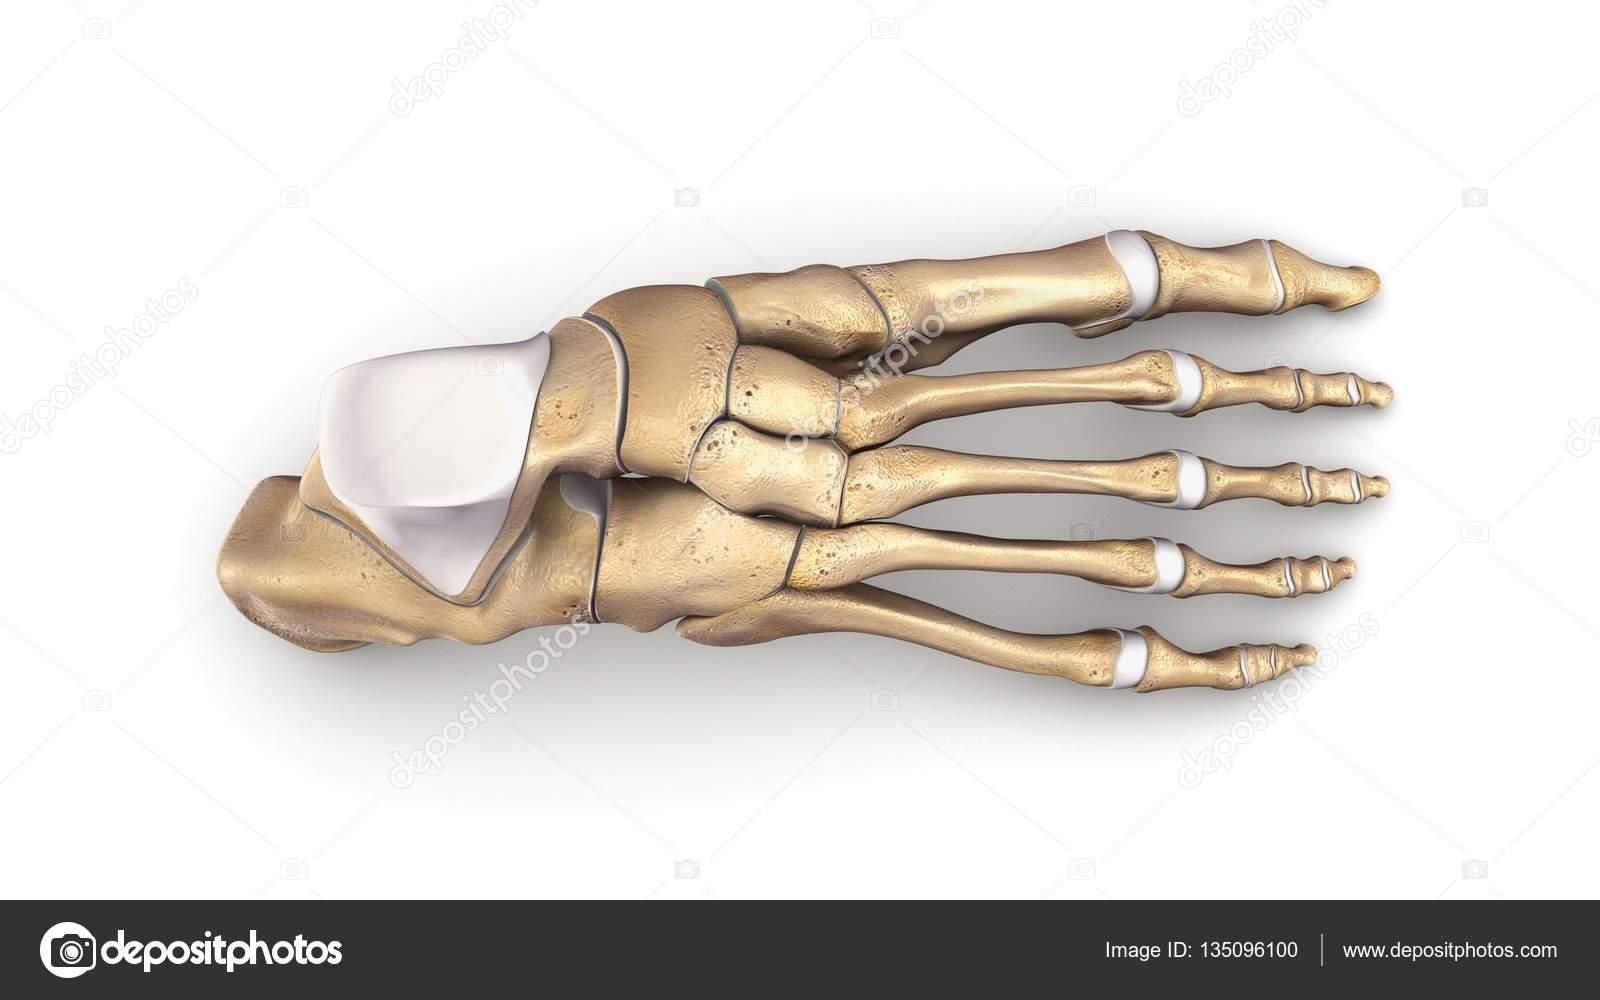 Fuss Knochen 3d illustration — Stockfoto © sciencepics #135096100